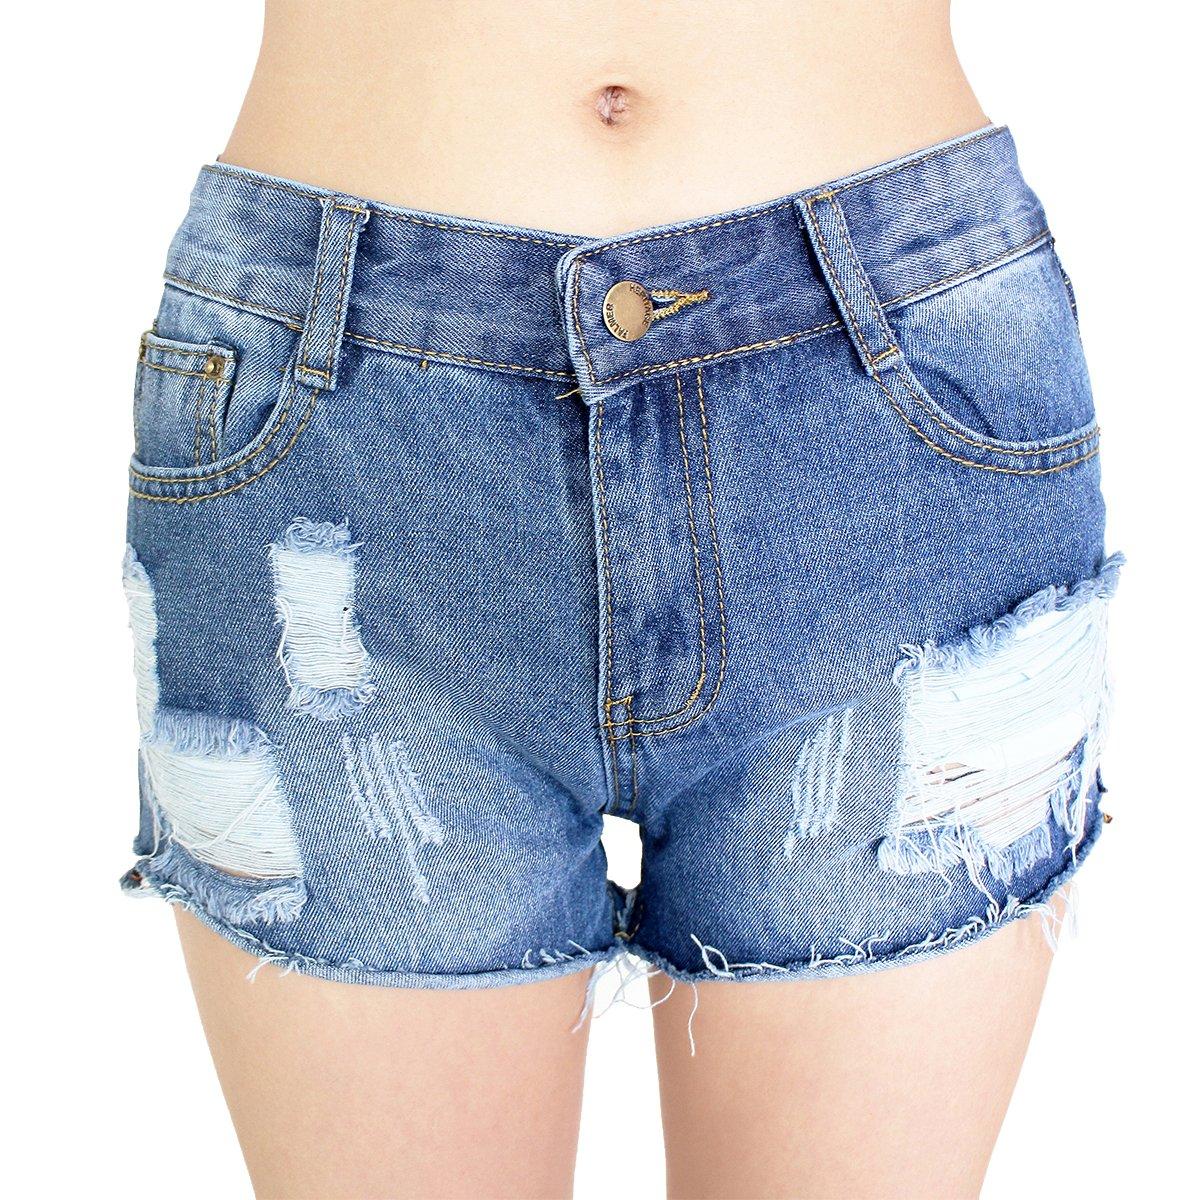 Dorekim Pantaloncini Denim da Donna Short Jeans Vita Bassa